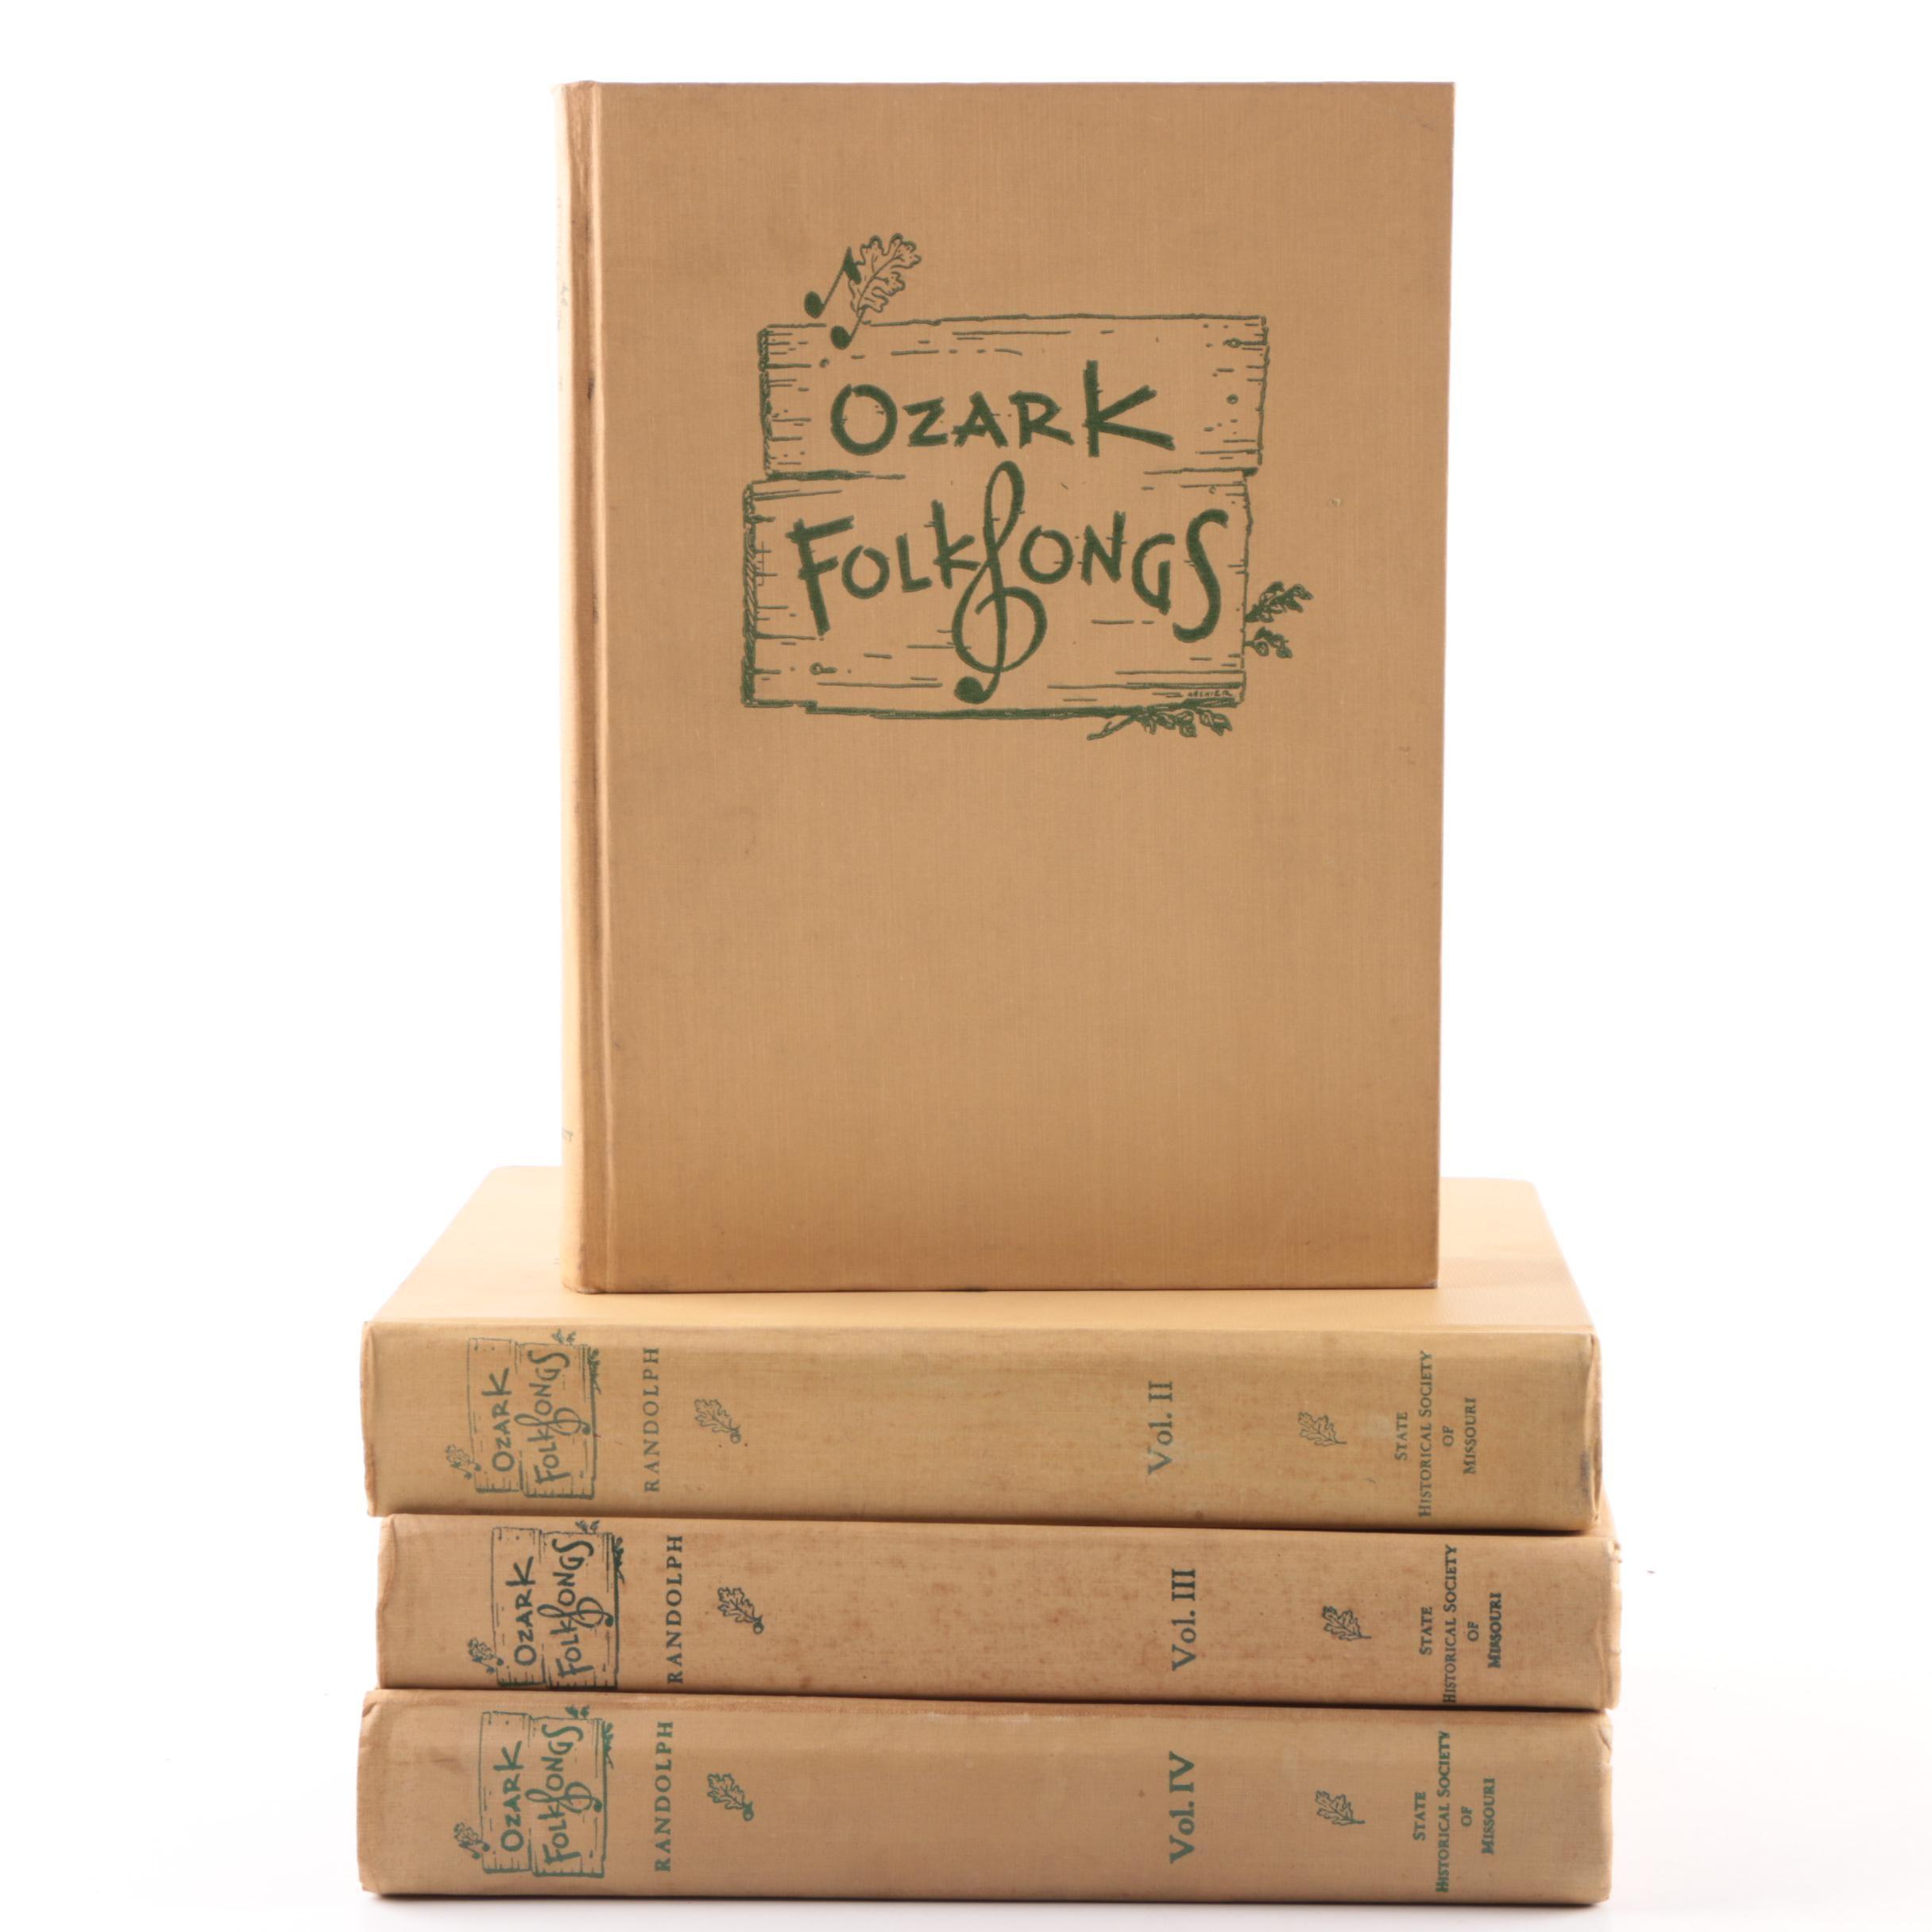 """Ozark Folk Songs"" Music Anthologies"